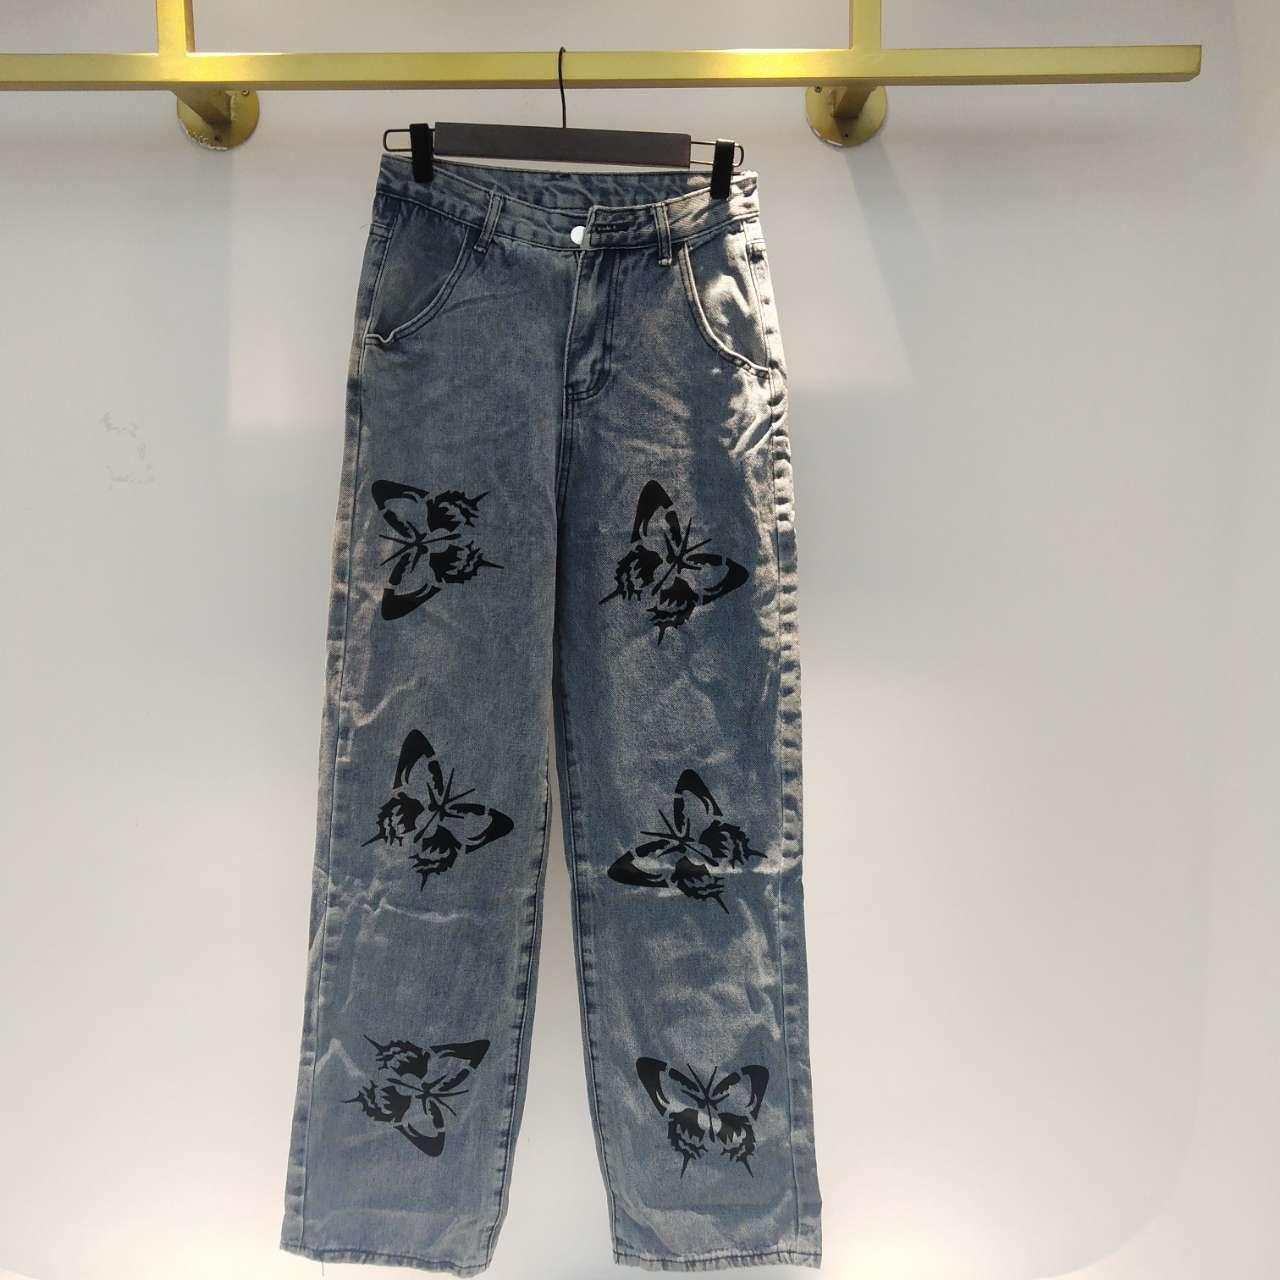 SHENGPALAE 2021 New Summer Vintage Jeans Woman Long Trousers Cowboy Female Loose Streetwear Butterfly Print Pants ZA4110 5